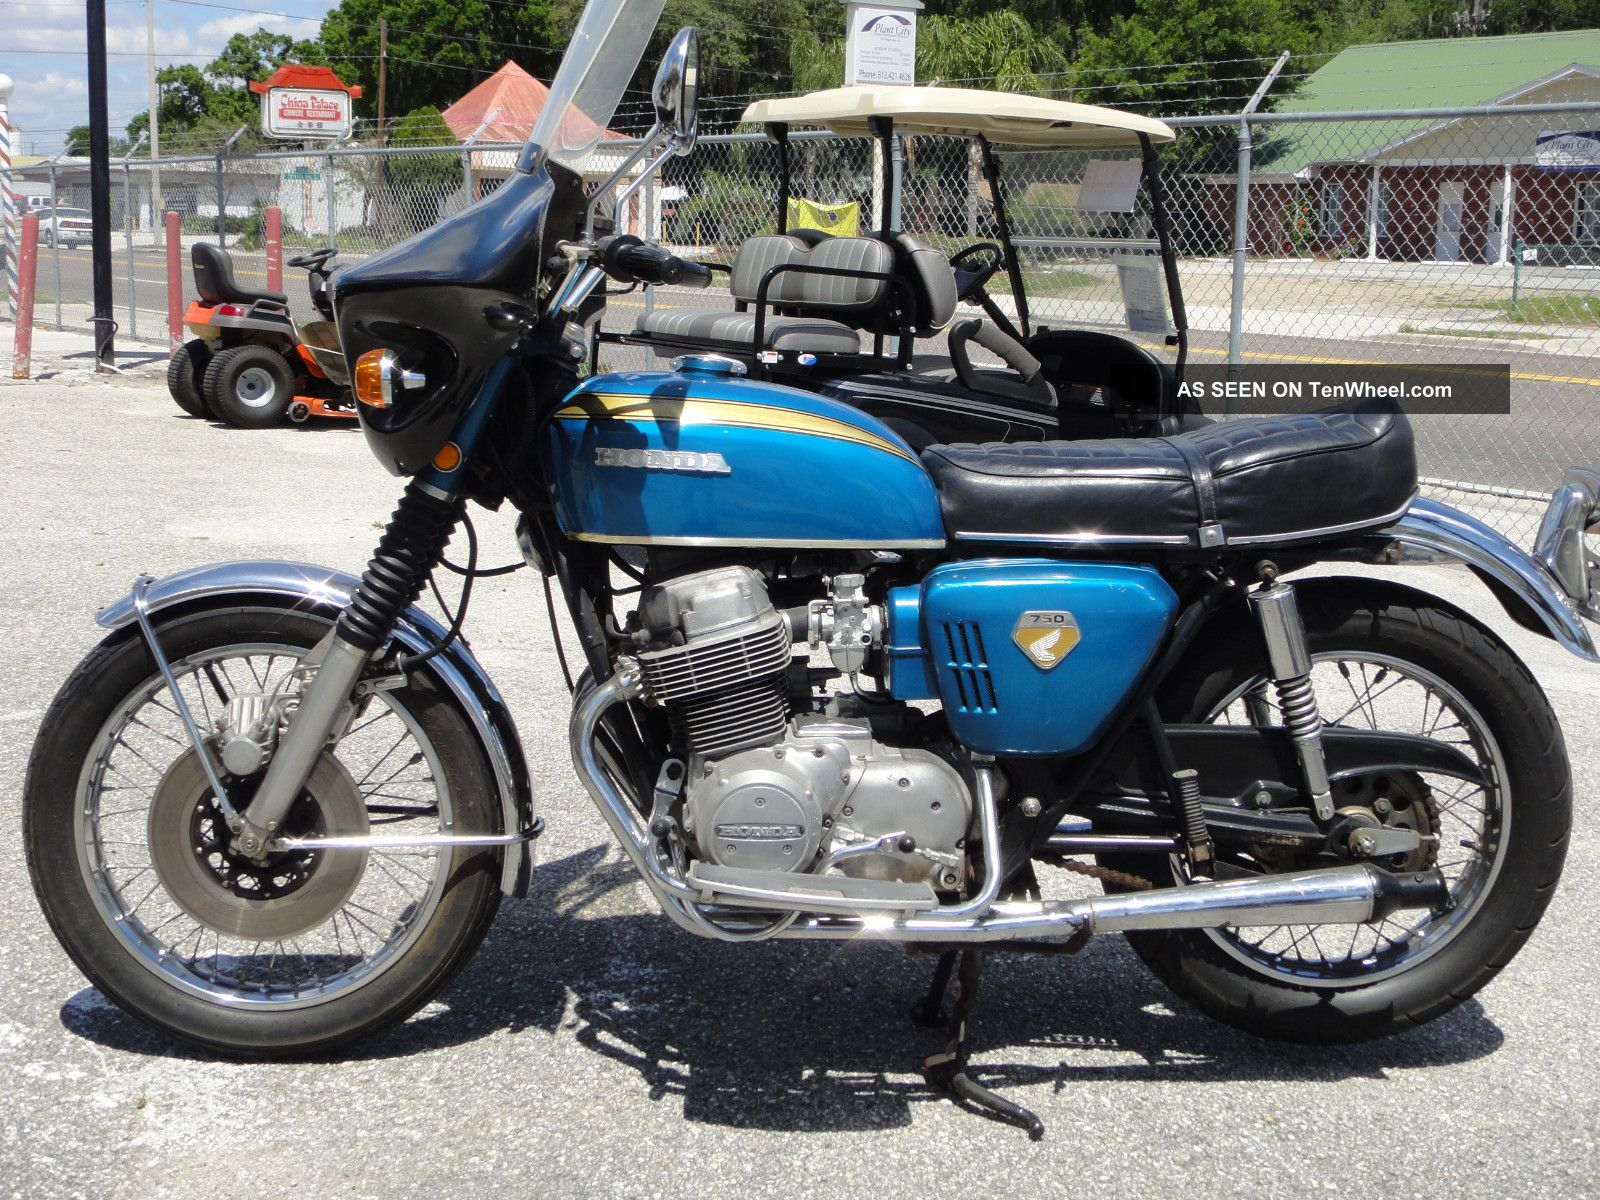 1970 Honda Cb750 Motorcycle 125cc